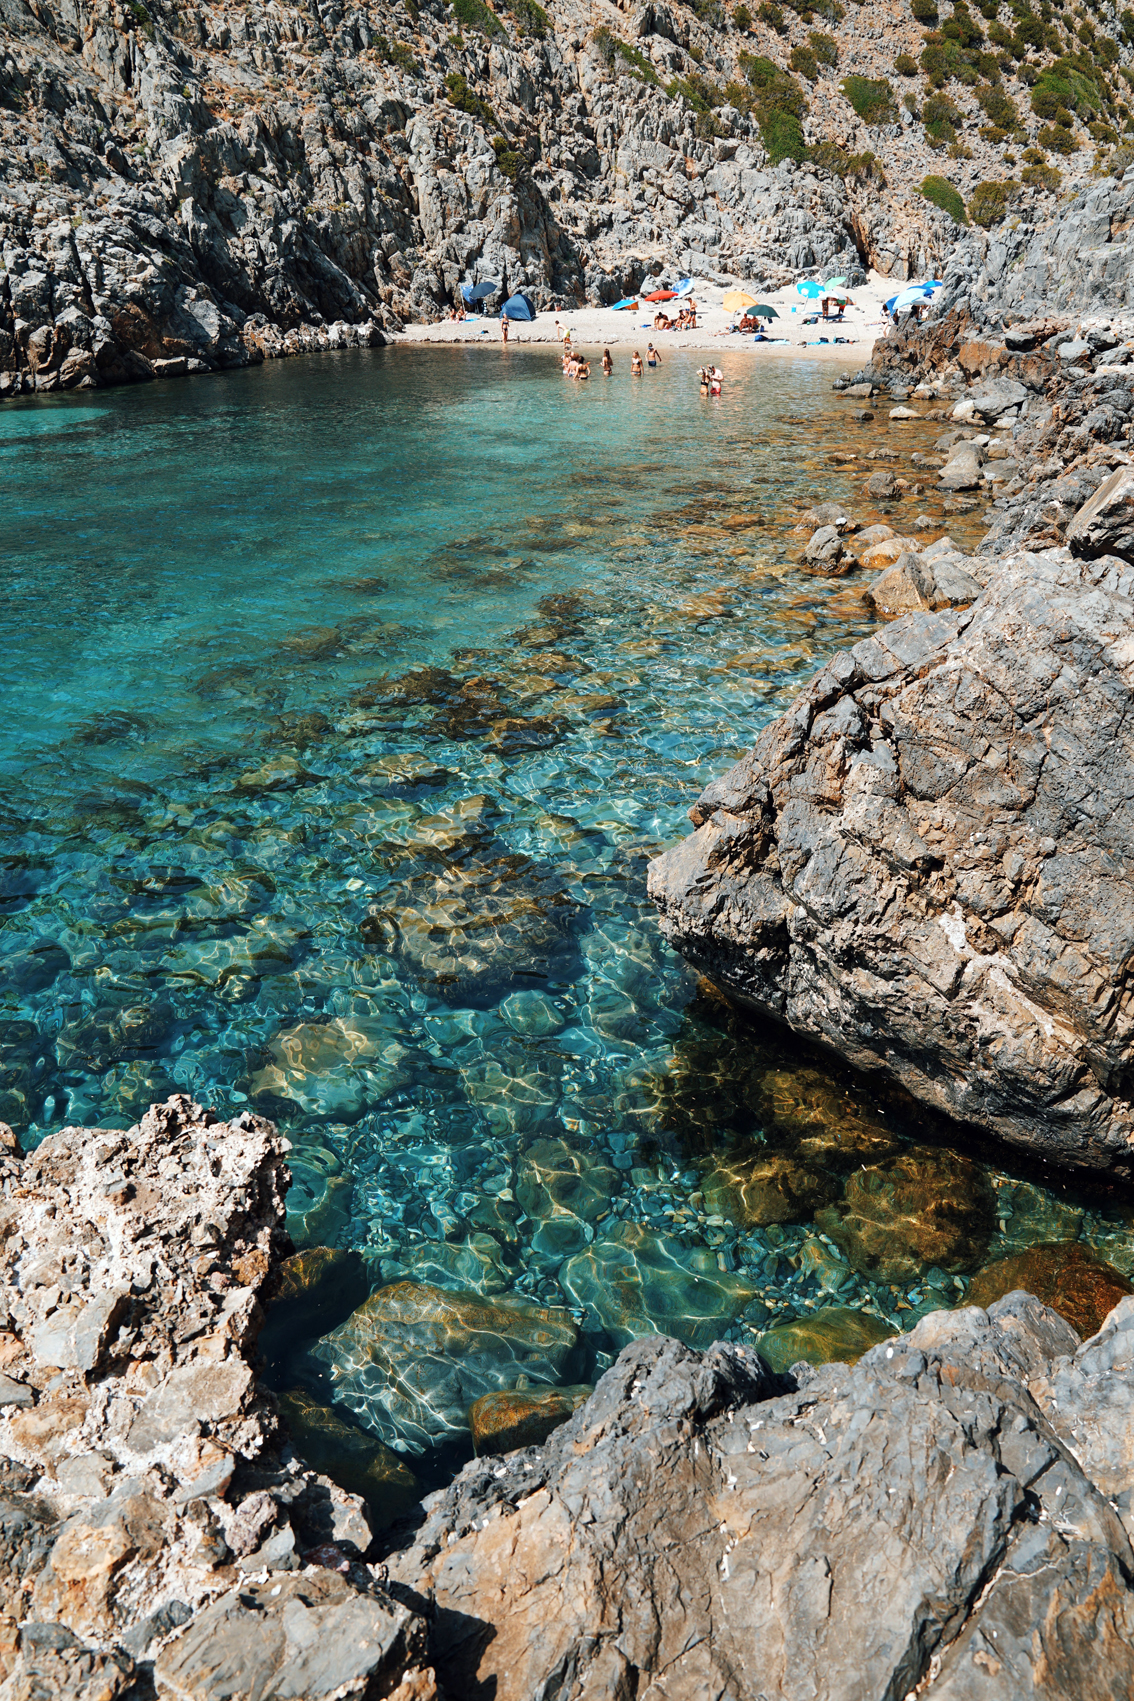 25 2 days in Cagliari ( Sardinia ), where to sleep to discover the best beaches.